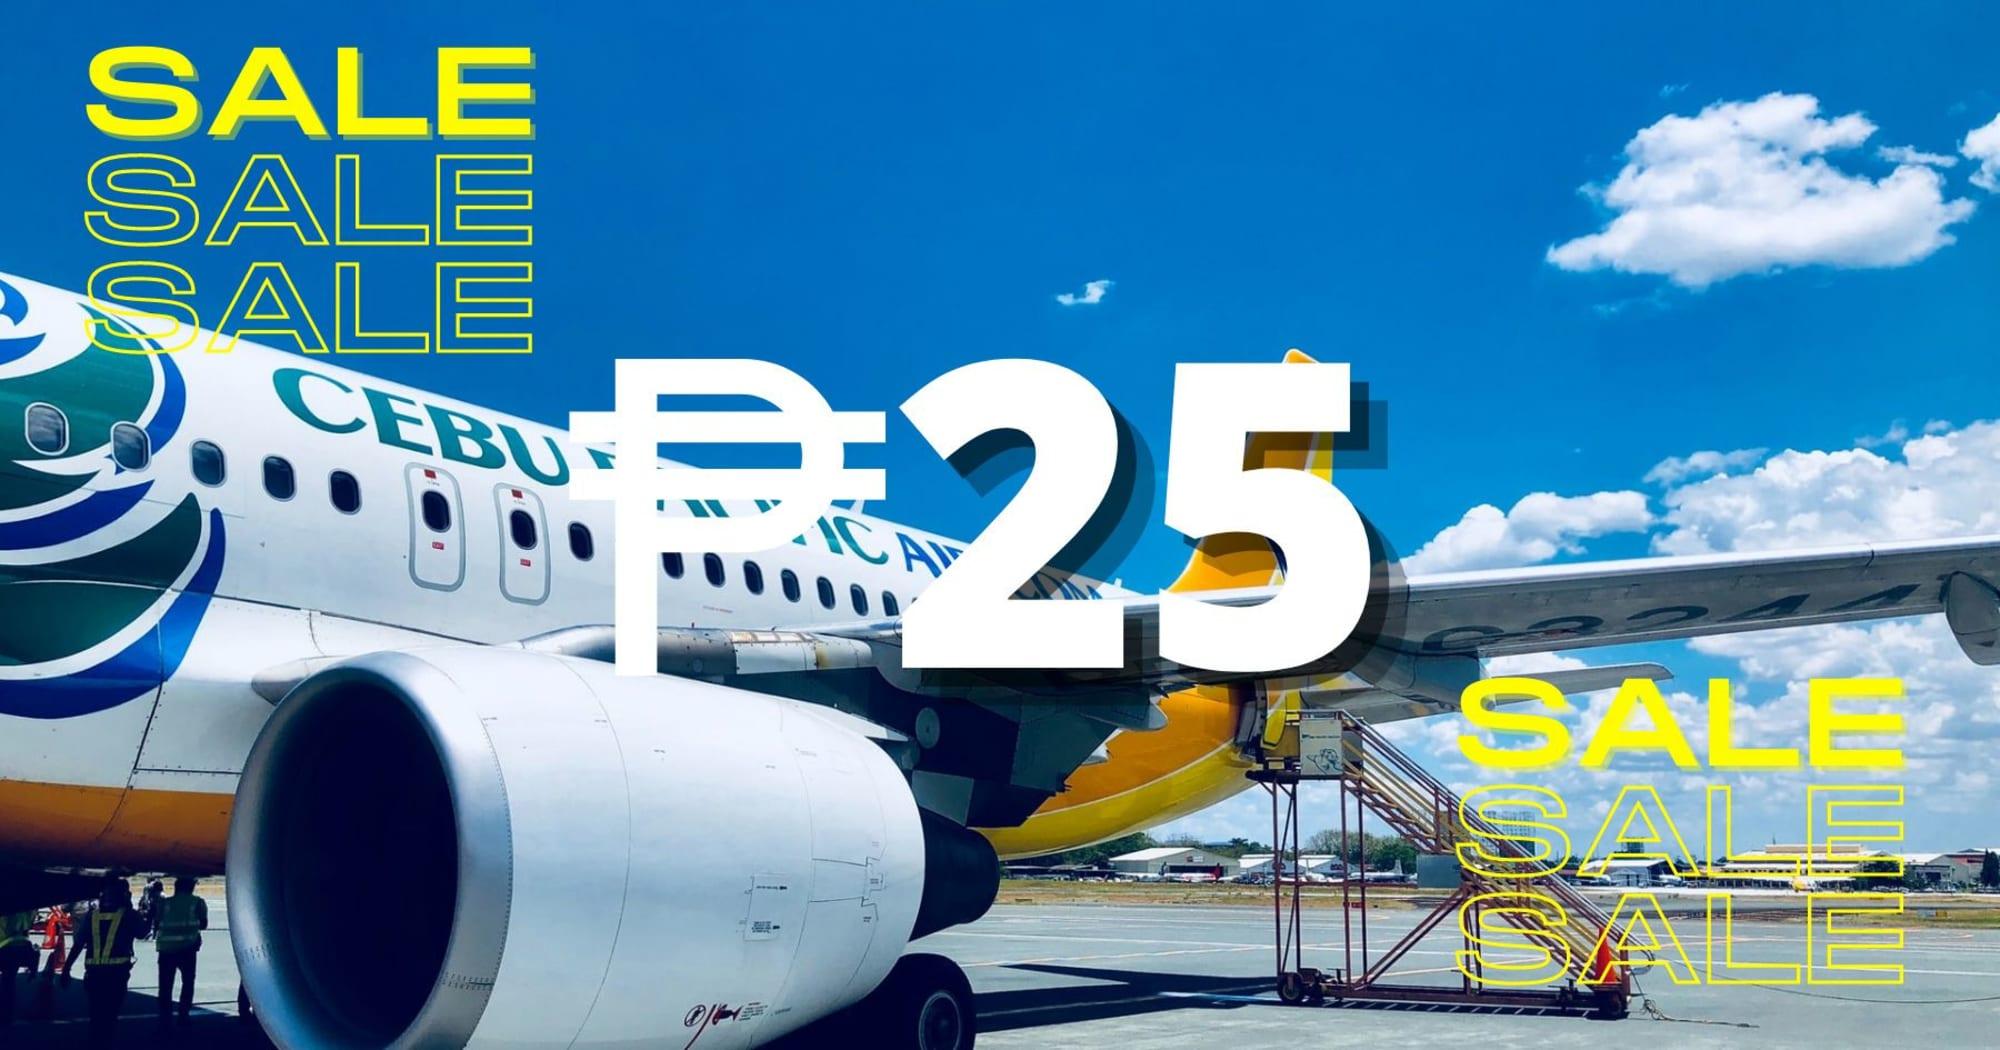 Cebu Pacific announces P25 sale for its 25 anniversary